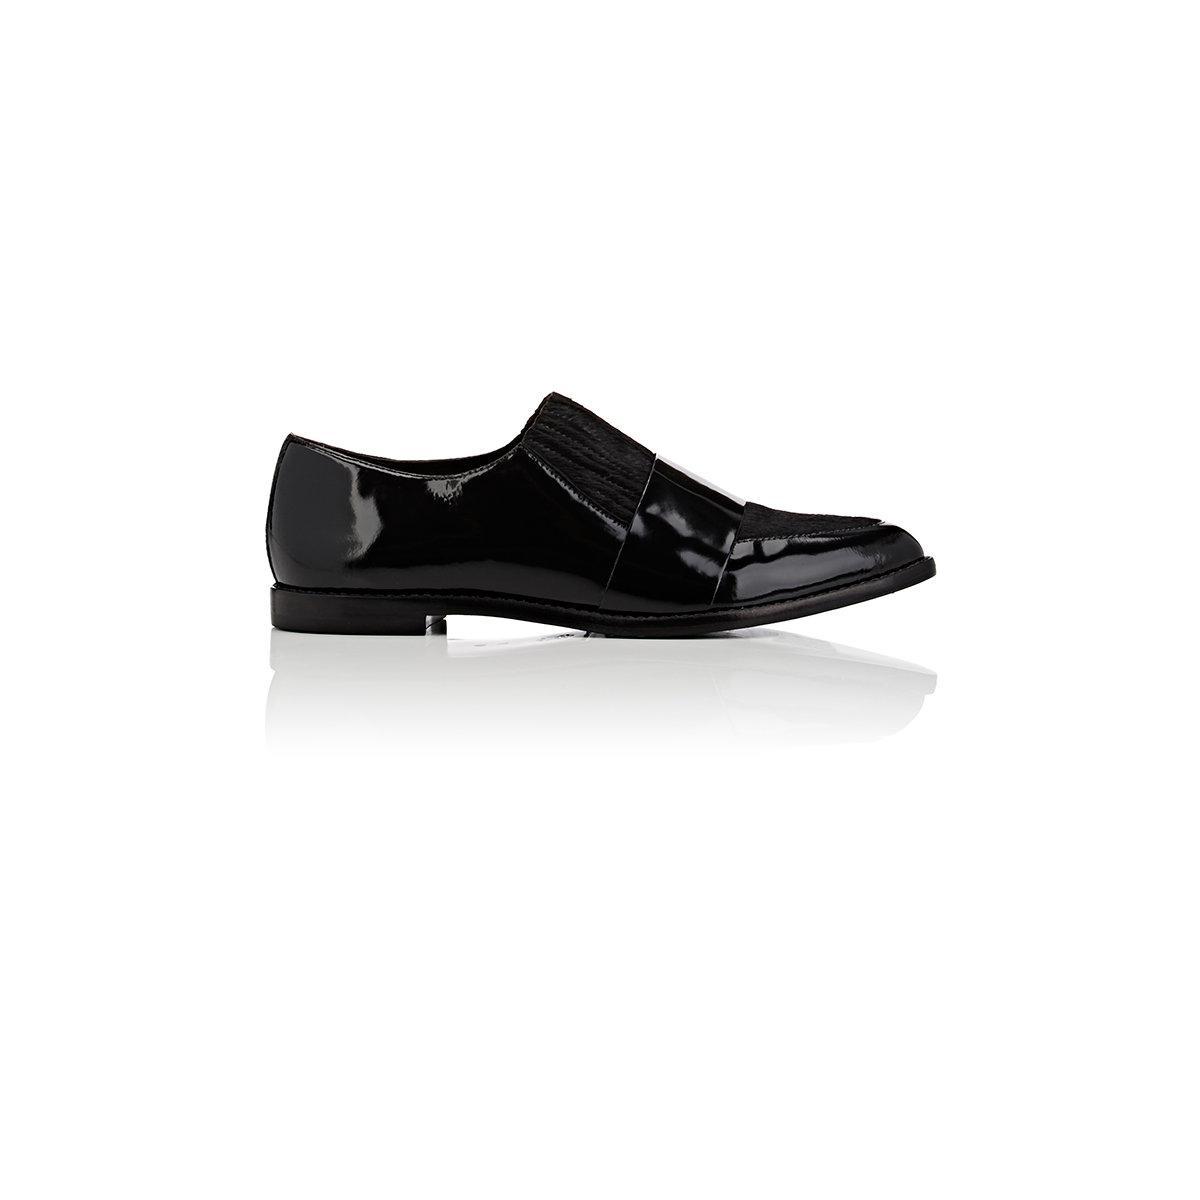 91e1f1ffb98 Lyst - Loeffler Randall Rosa Loafers in Black